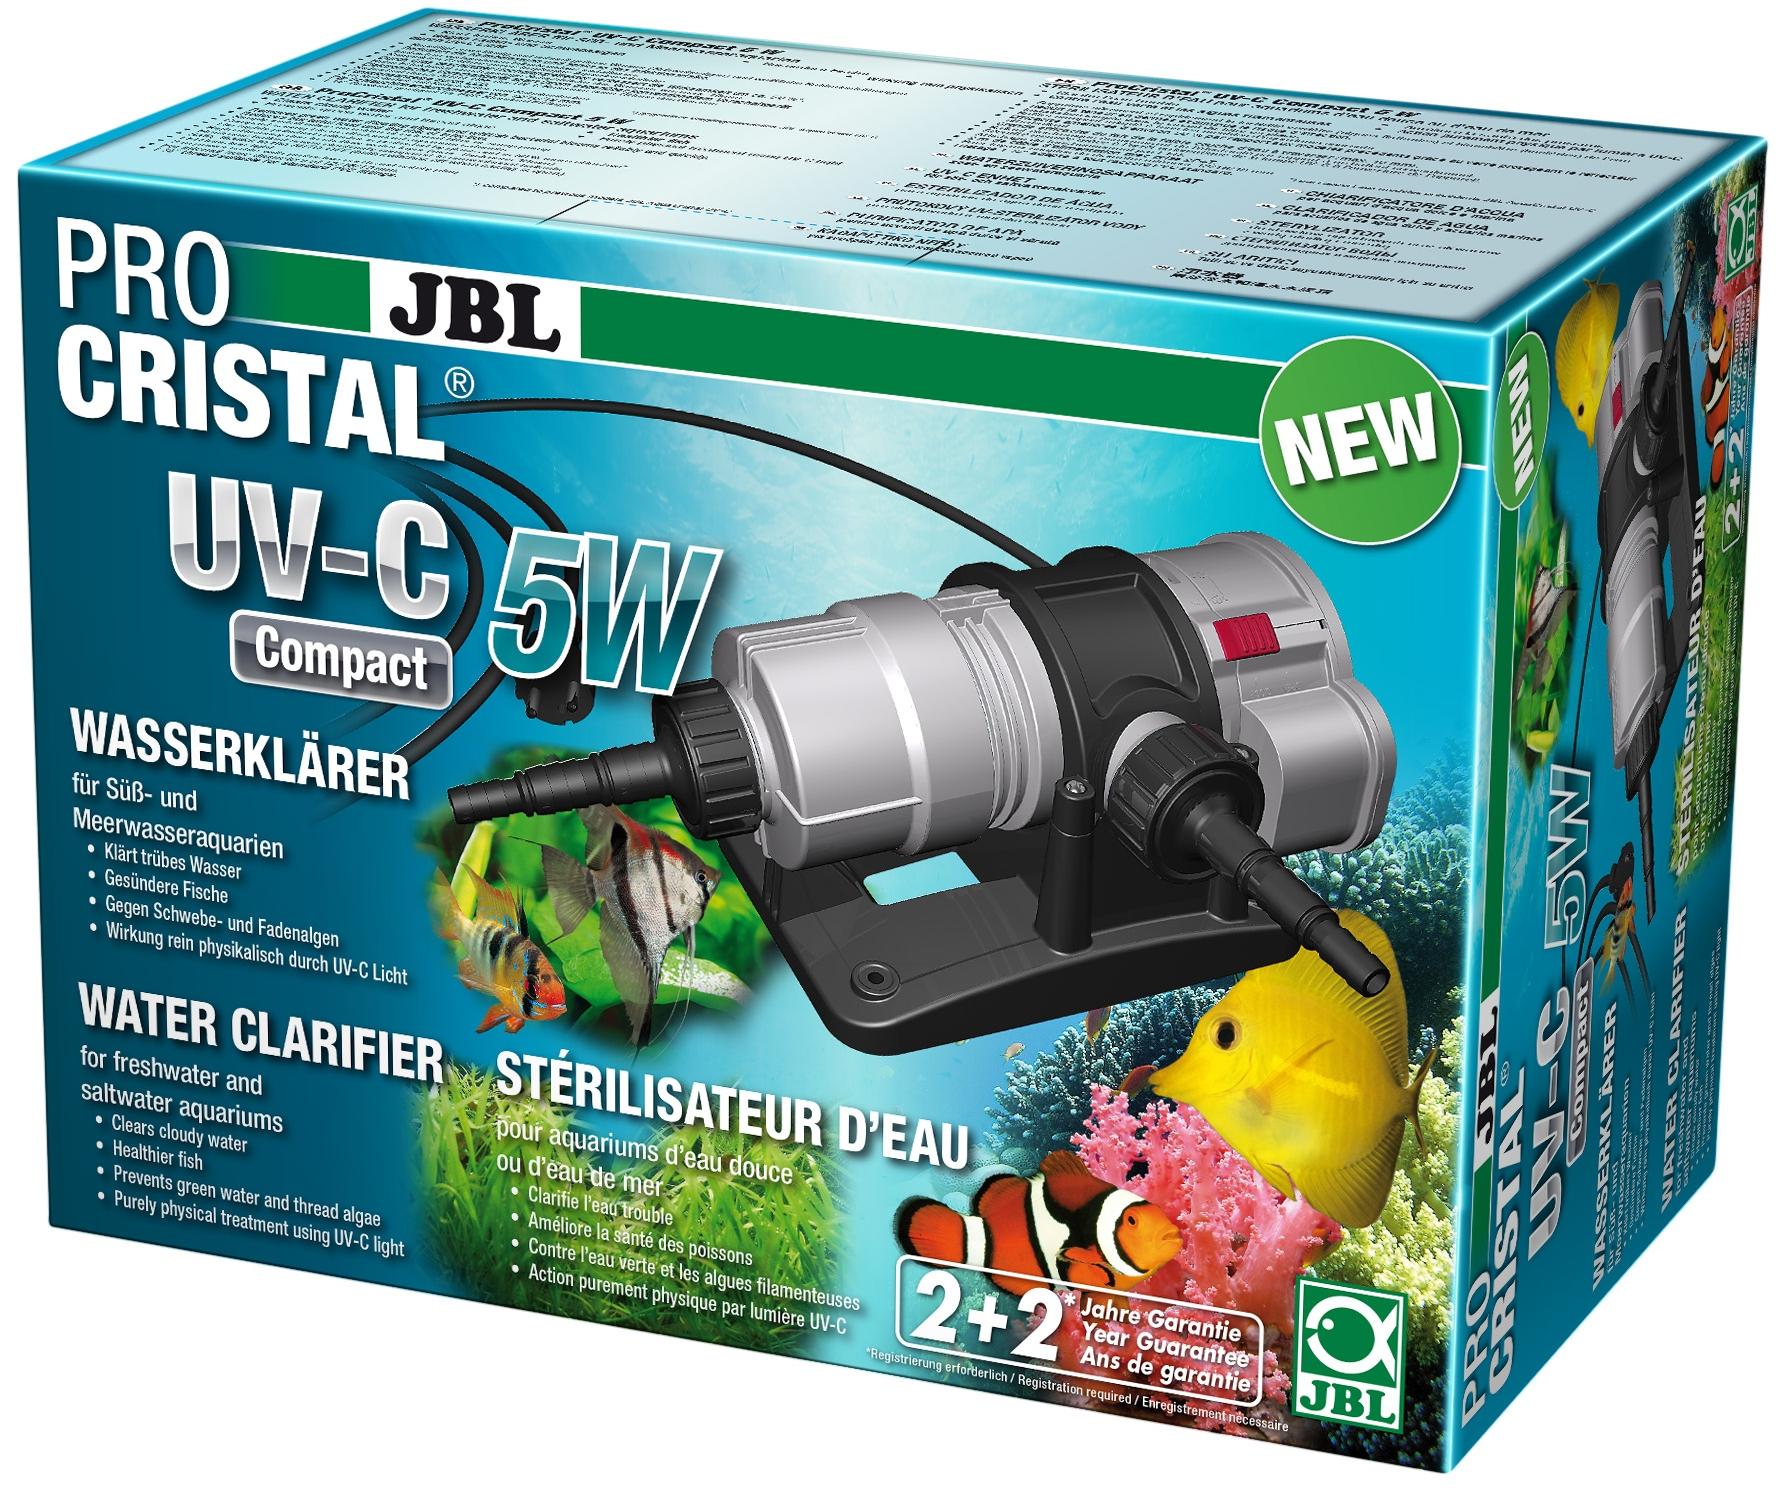 Jbl Procristal Compact Uv C 5 W